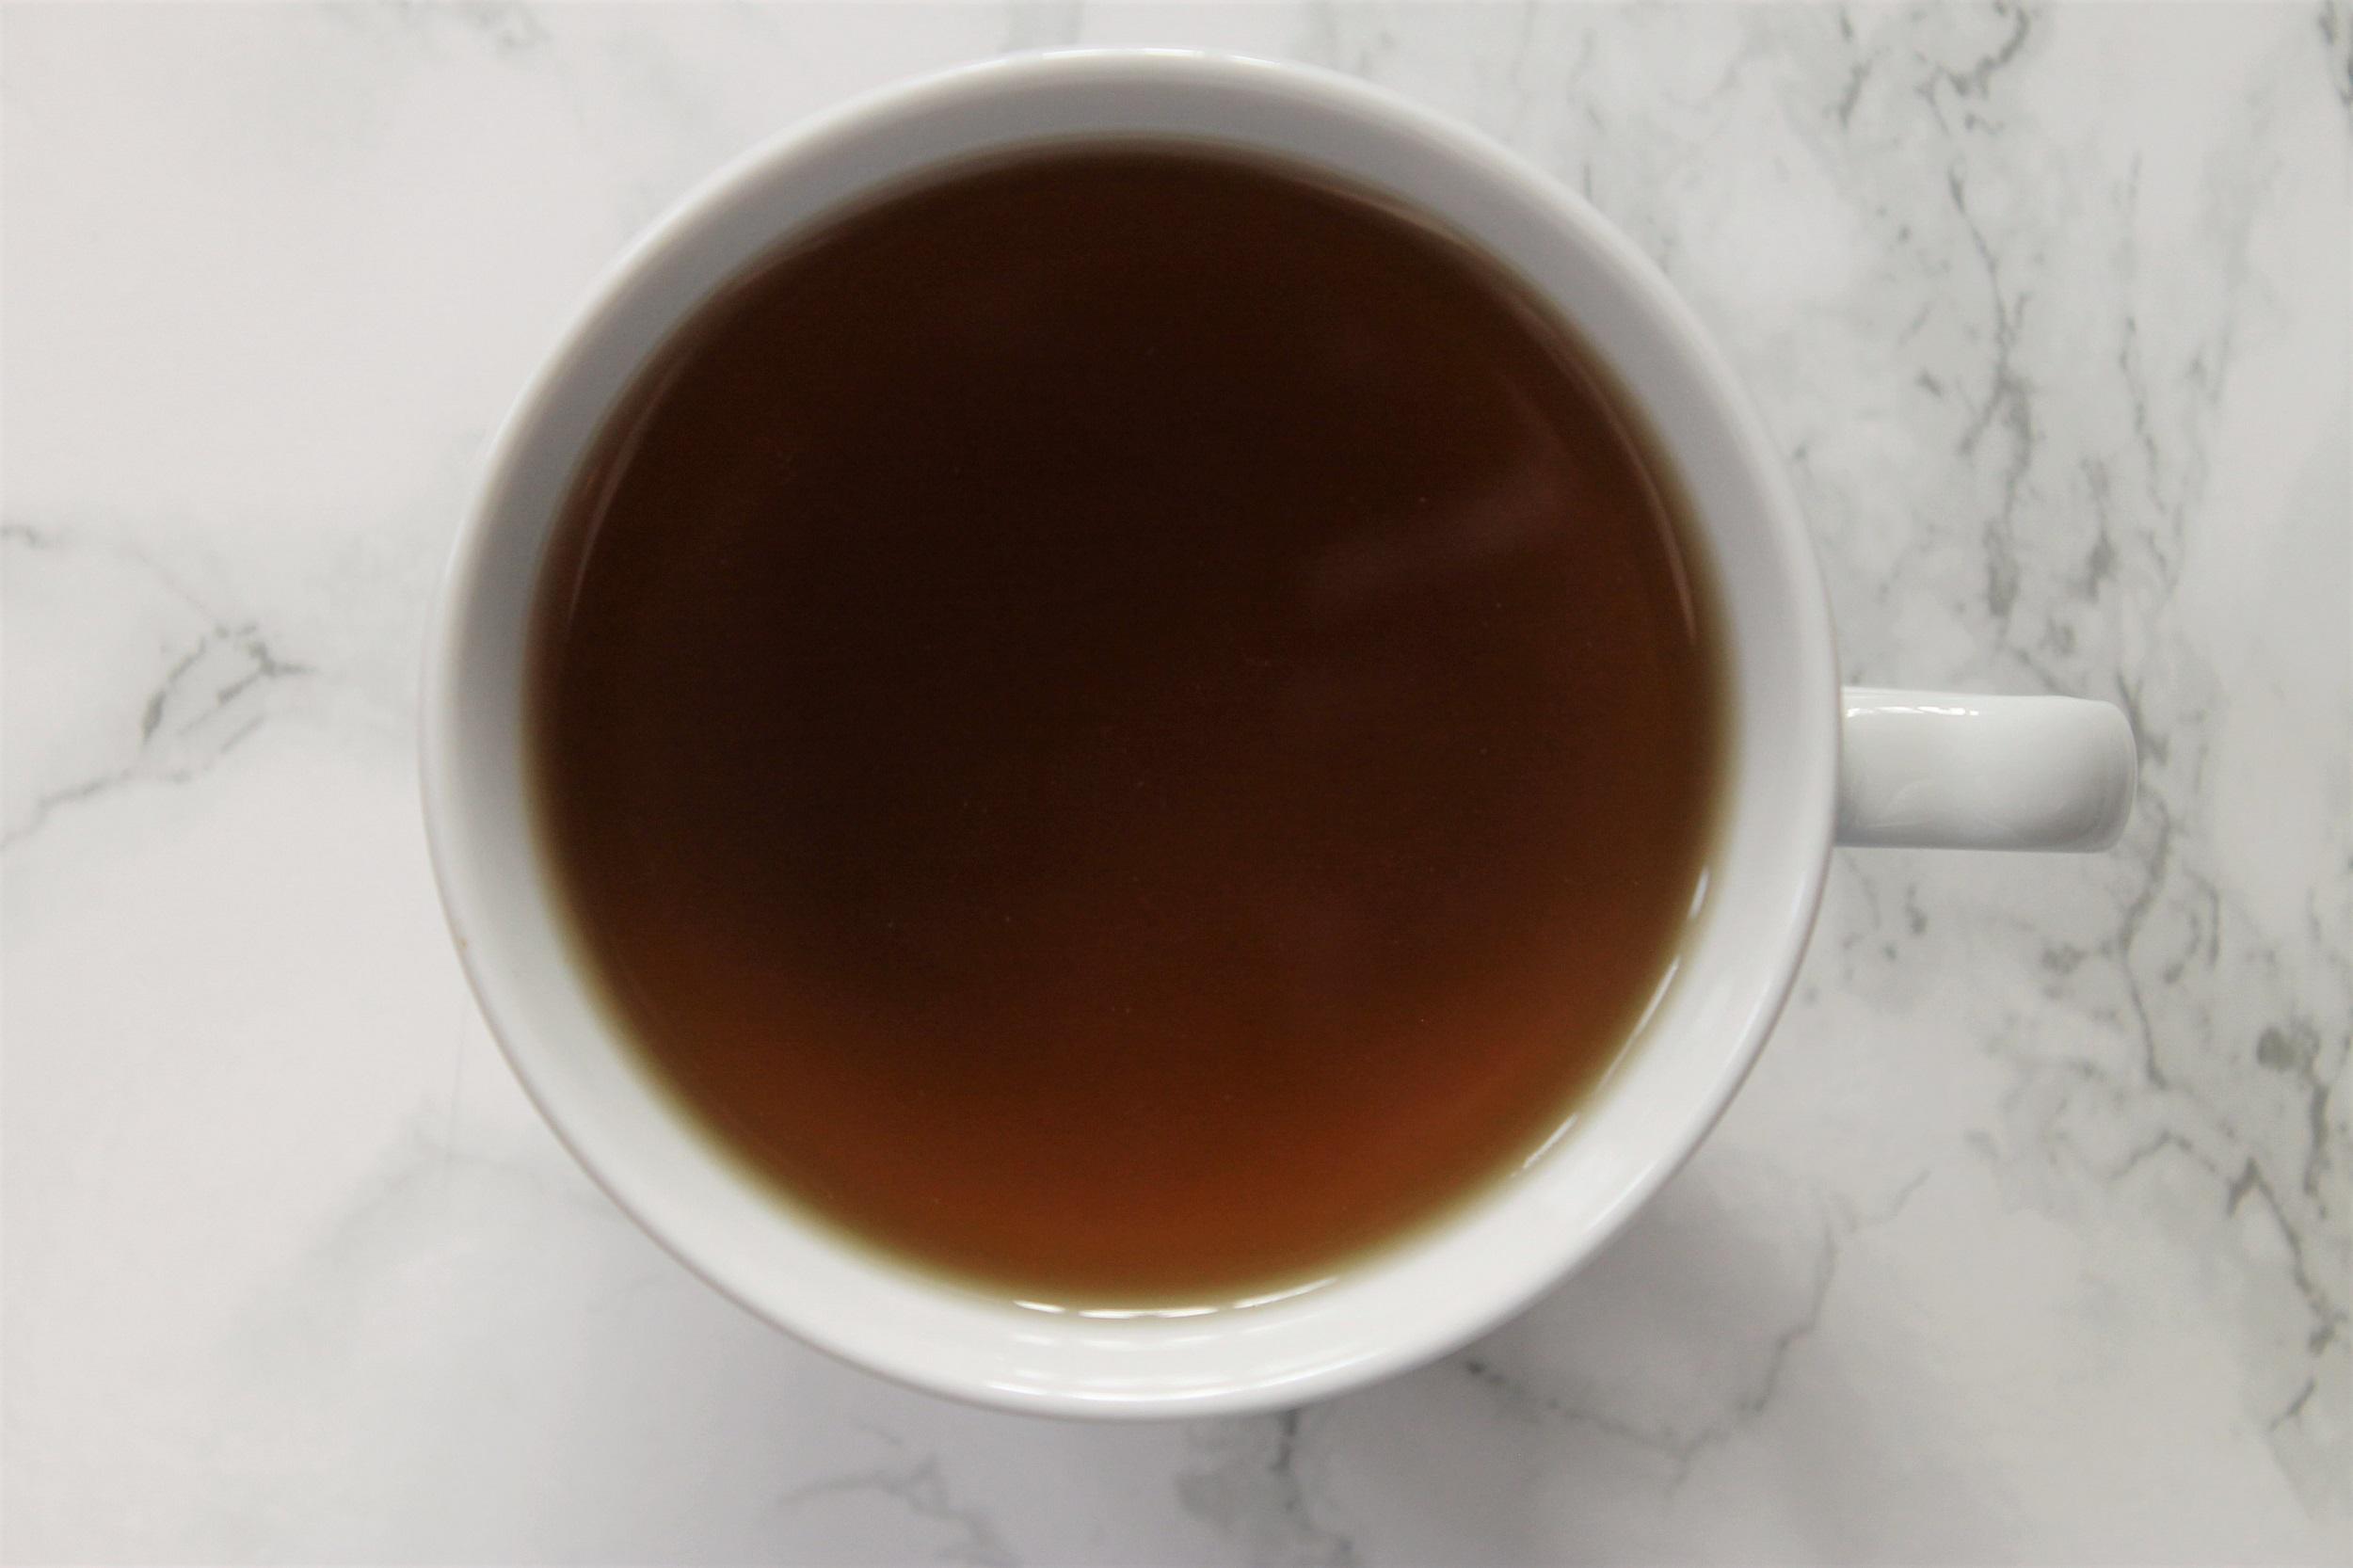 peppermint herbal tea in white teacup